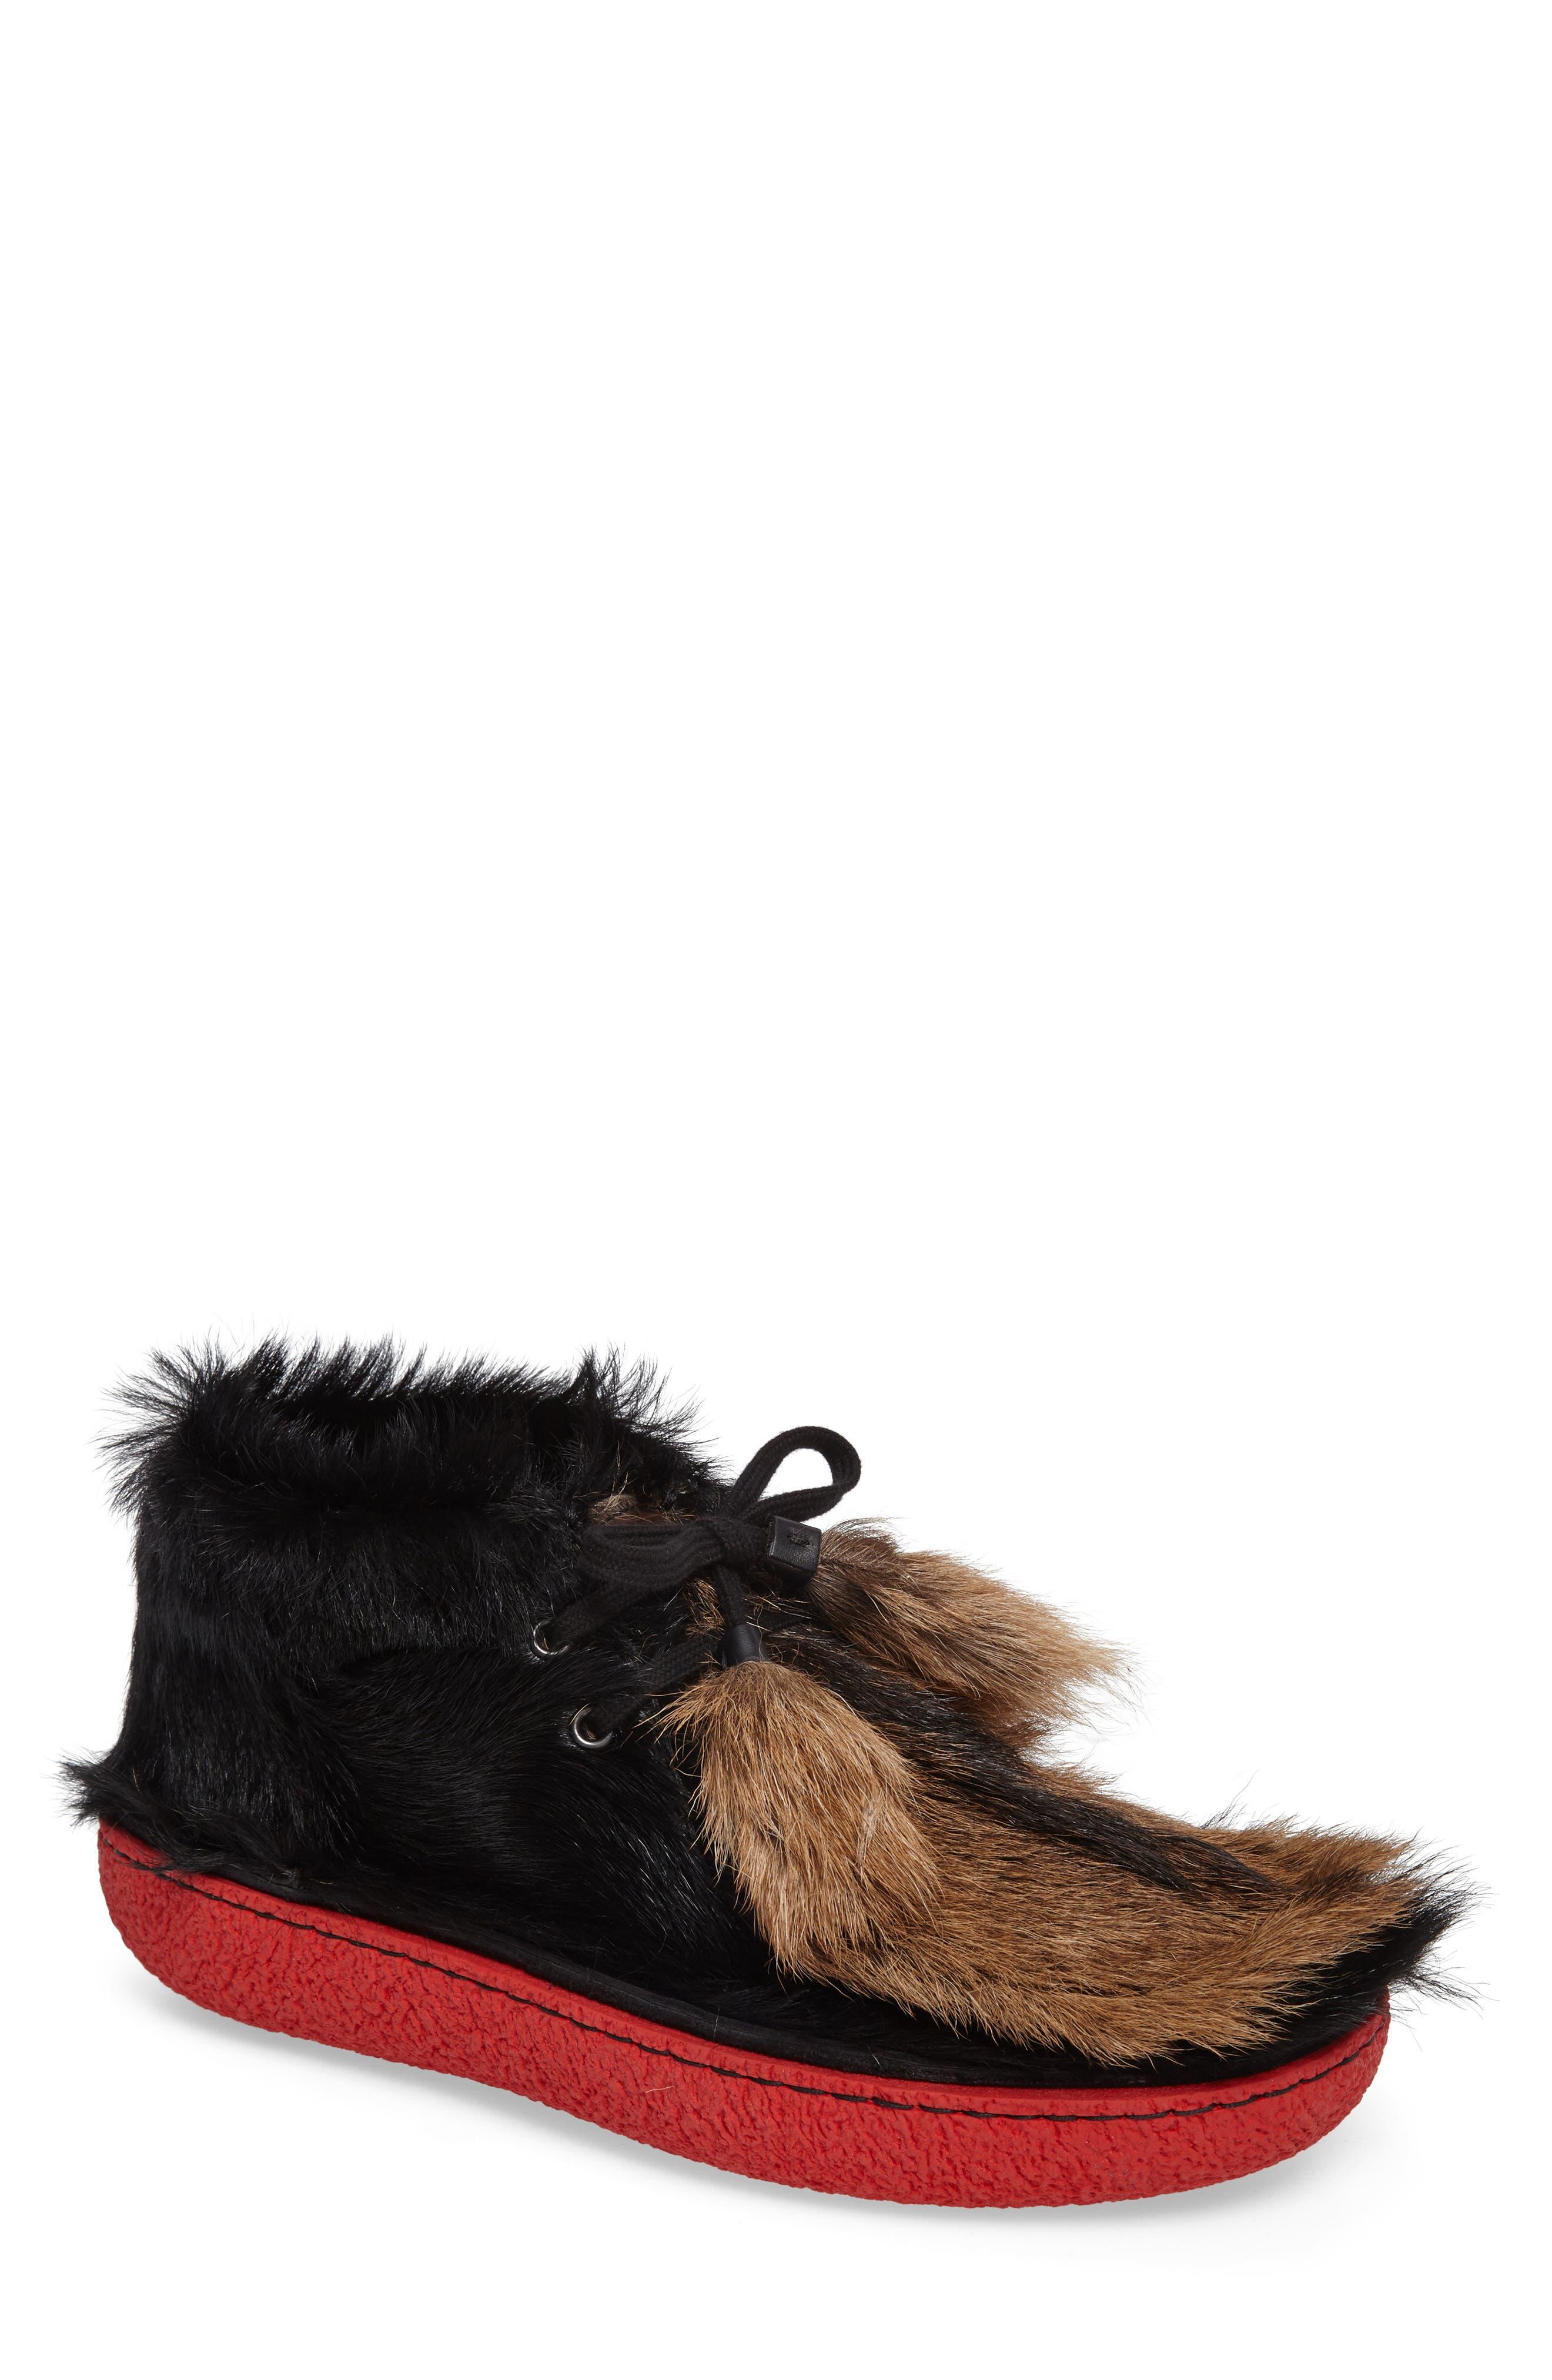 Genuine Calf and Goat Hair Chukka Boot,                         Main,                         color, 001